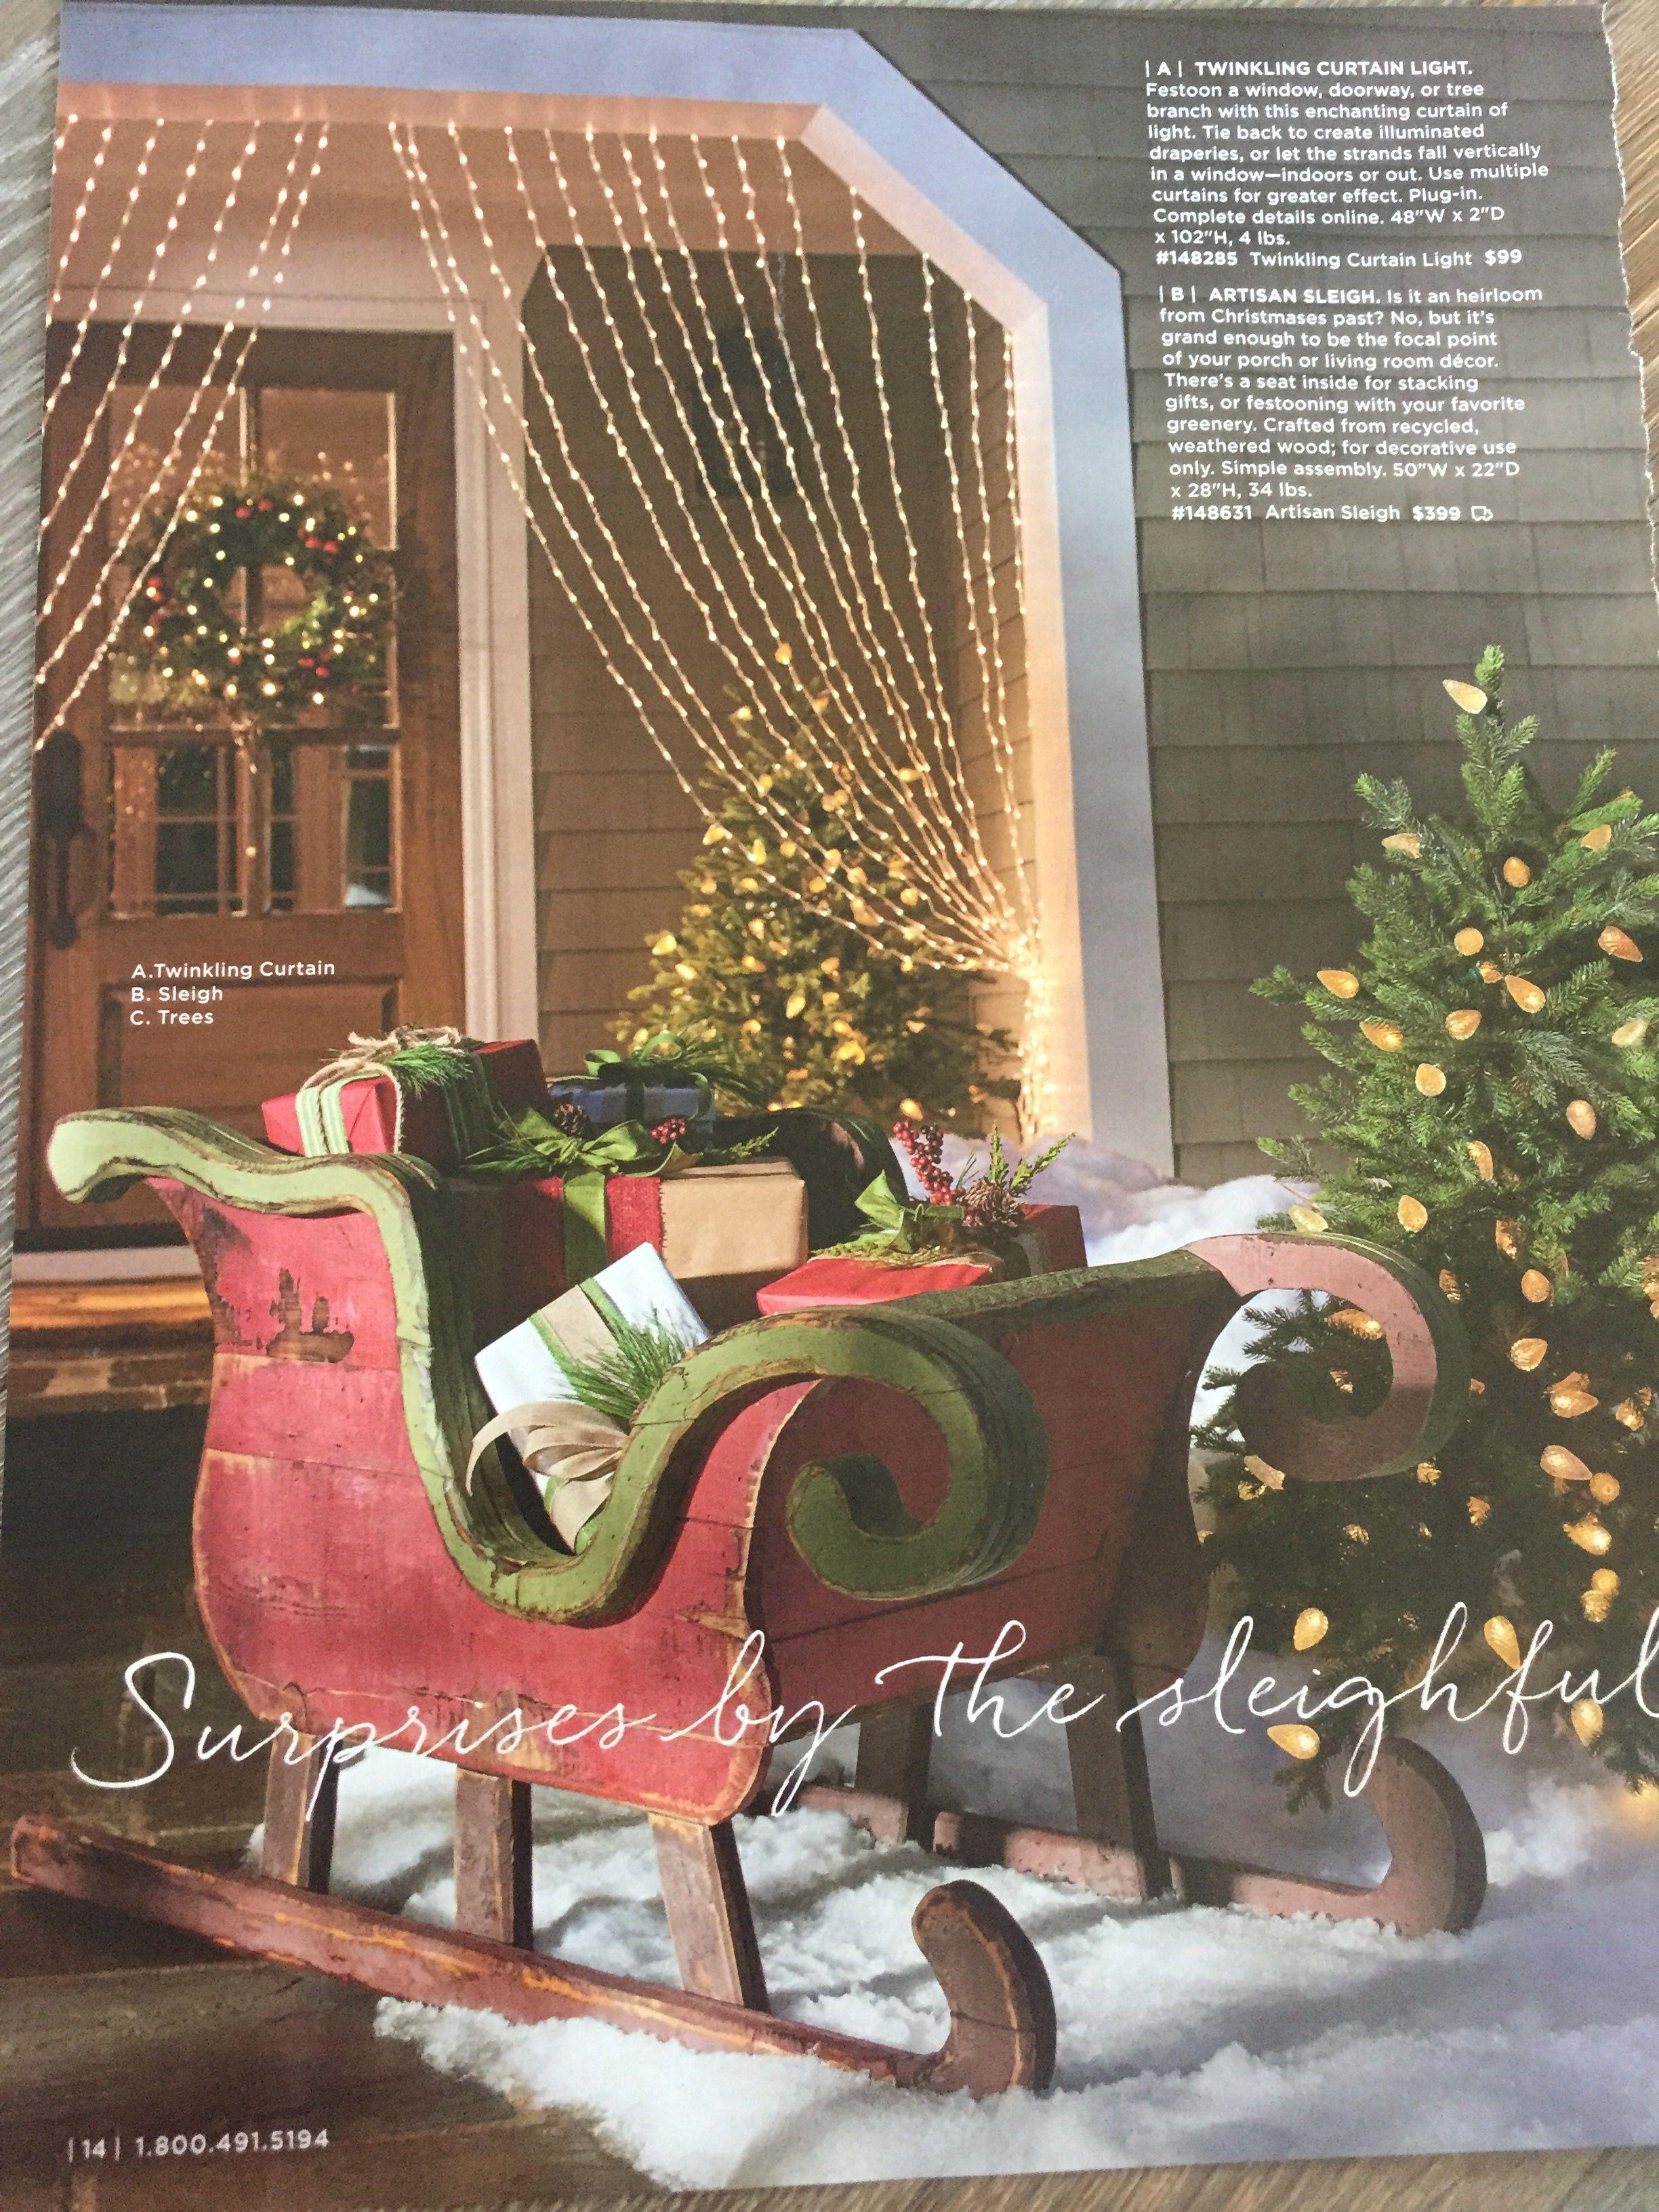 I Love The Ling Light Curtain Grandinroad Christmas Sleighs Sleigh Decoration Sled